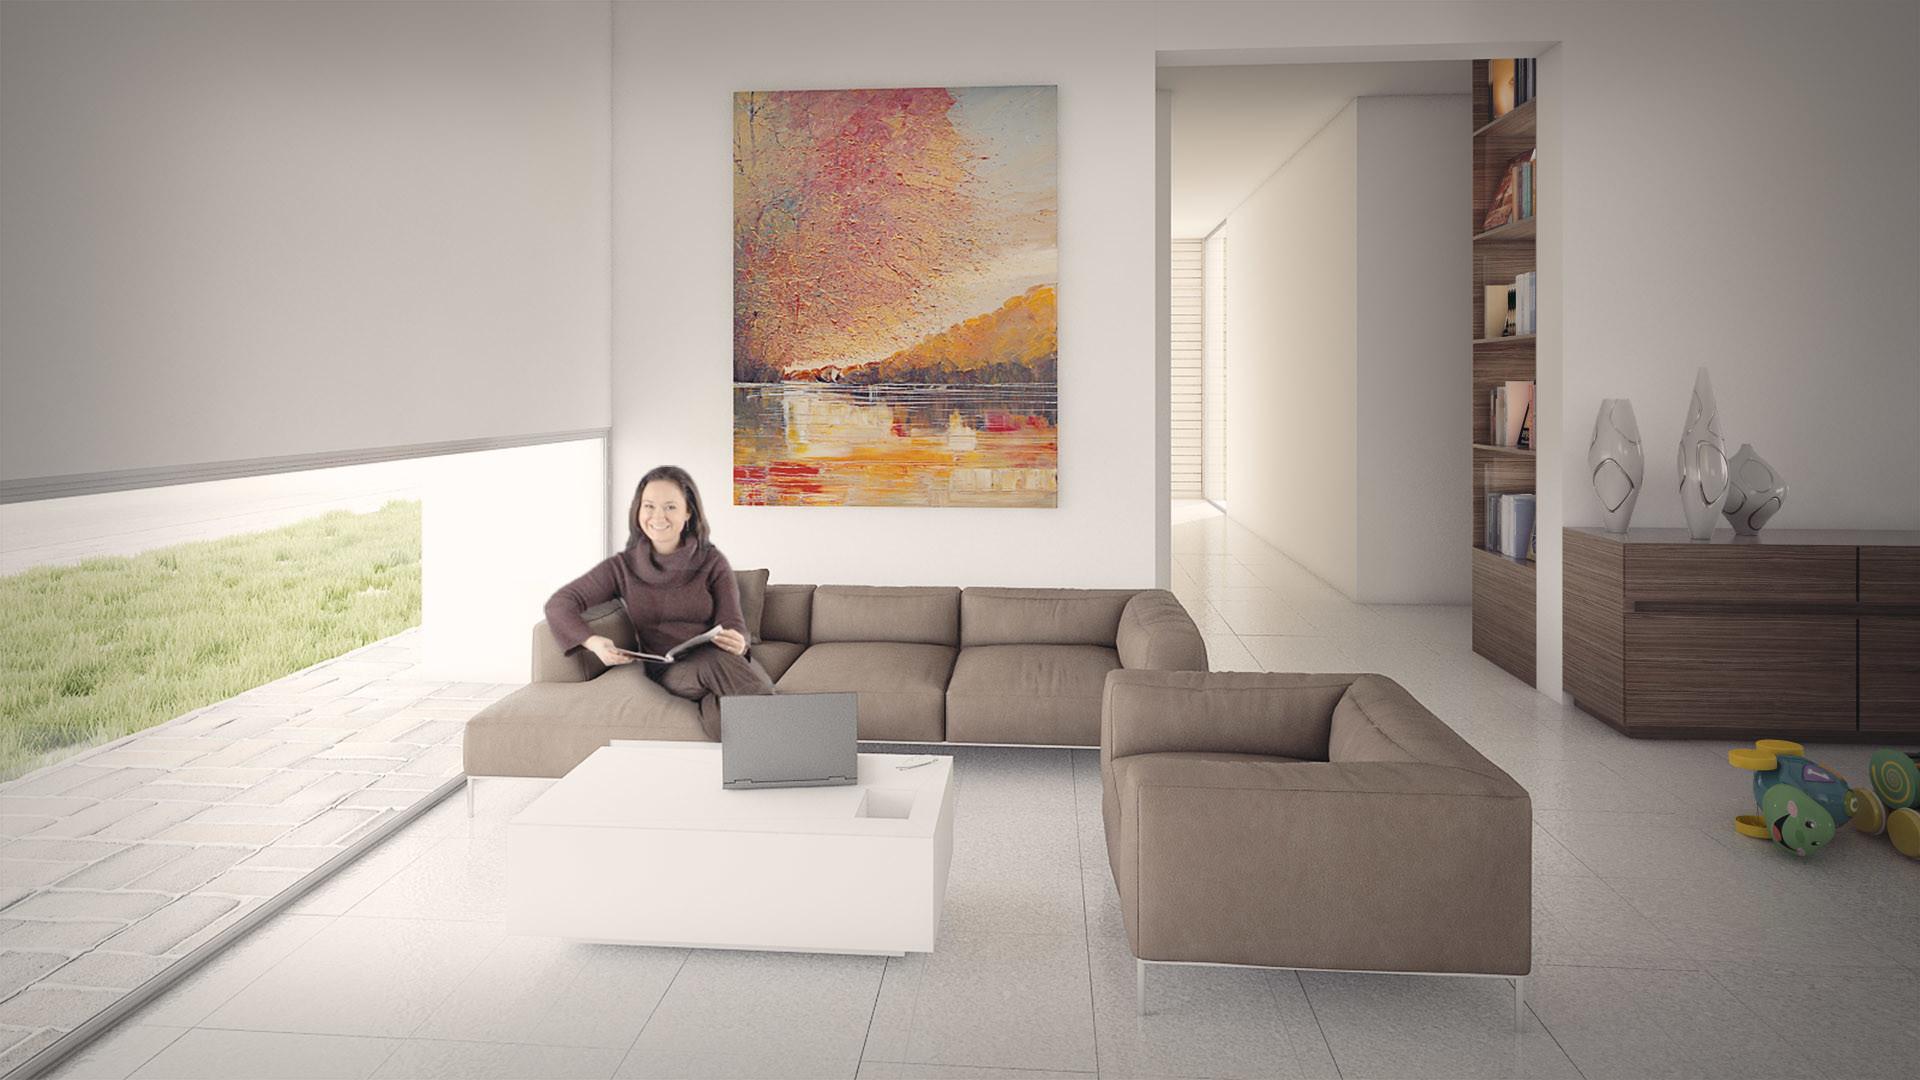 Bruno bolognesi interior 01 tif